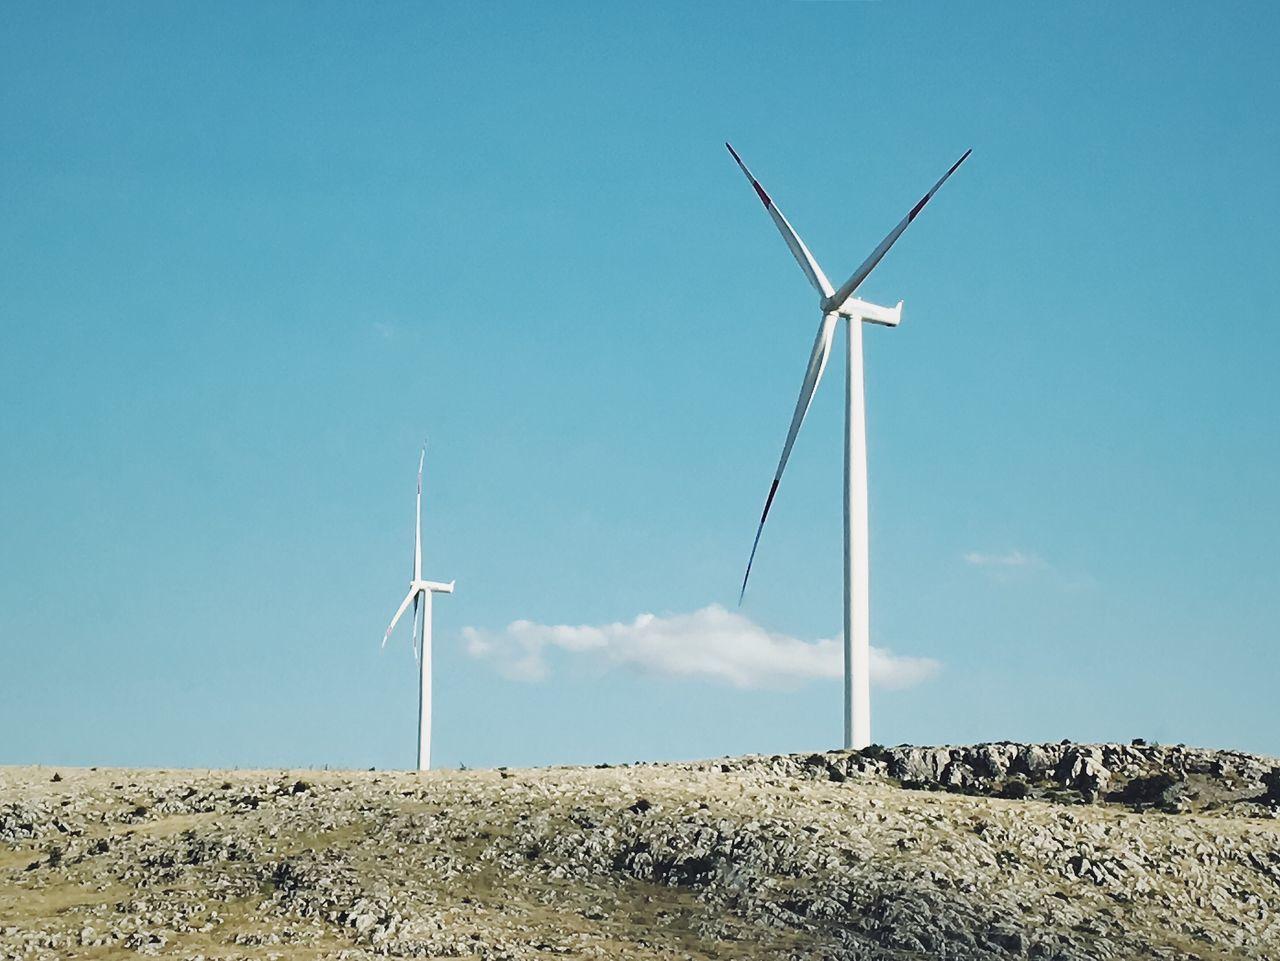 Wind power plant in Dinar, Turkey. Wind Power Turbine Wind Power Plant Blue Blue Sky No People Energy Electricity  Minimalism Minimal Wind Turbine EyeEm Best Shots EyeEm Gallery IPhoneography Adobe Photoshop Express Afyon